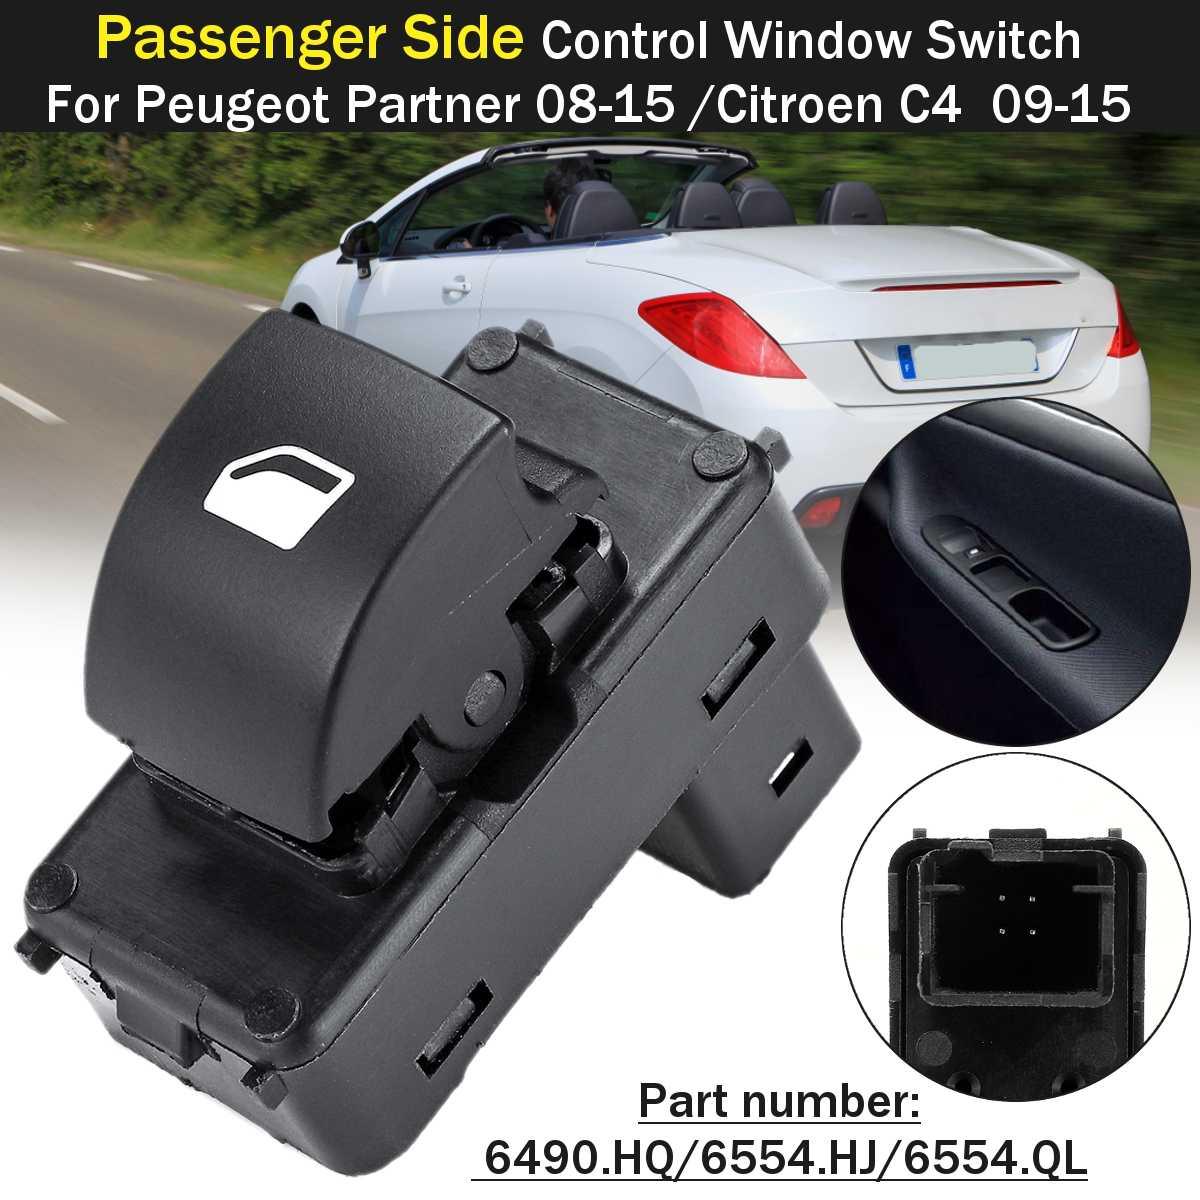 Car Window Passenger Switch Button For Peugeot Partner 207 Citroen C4 B7 2008 2009 2010 2011 2012 2013 2014 2015 6490.E3 6490E3